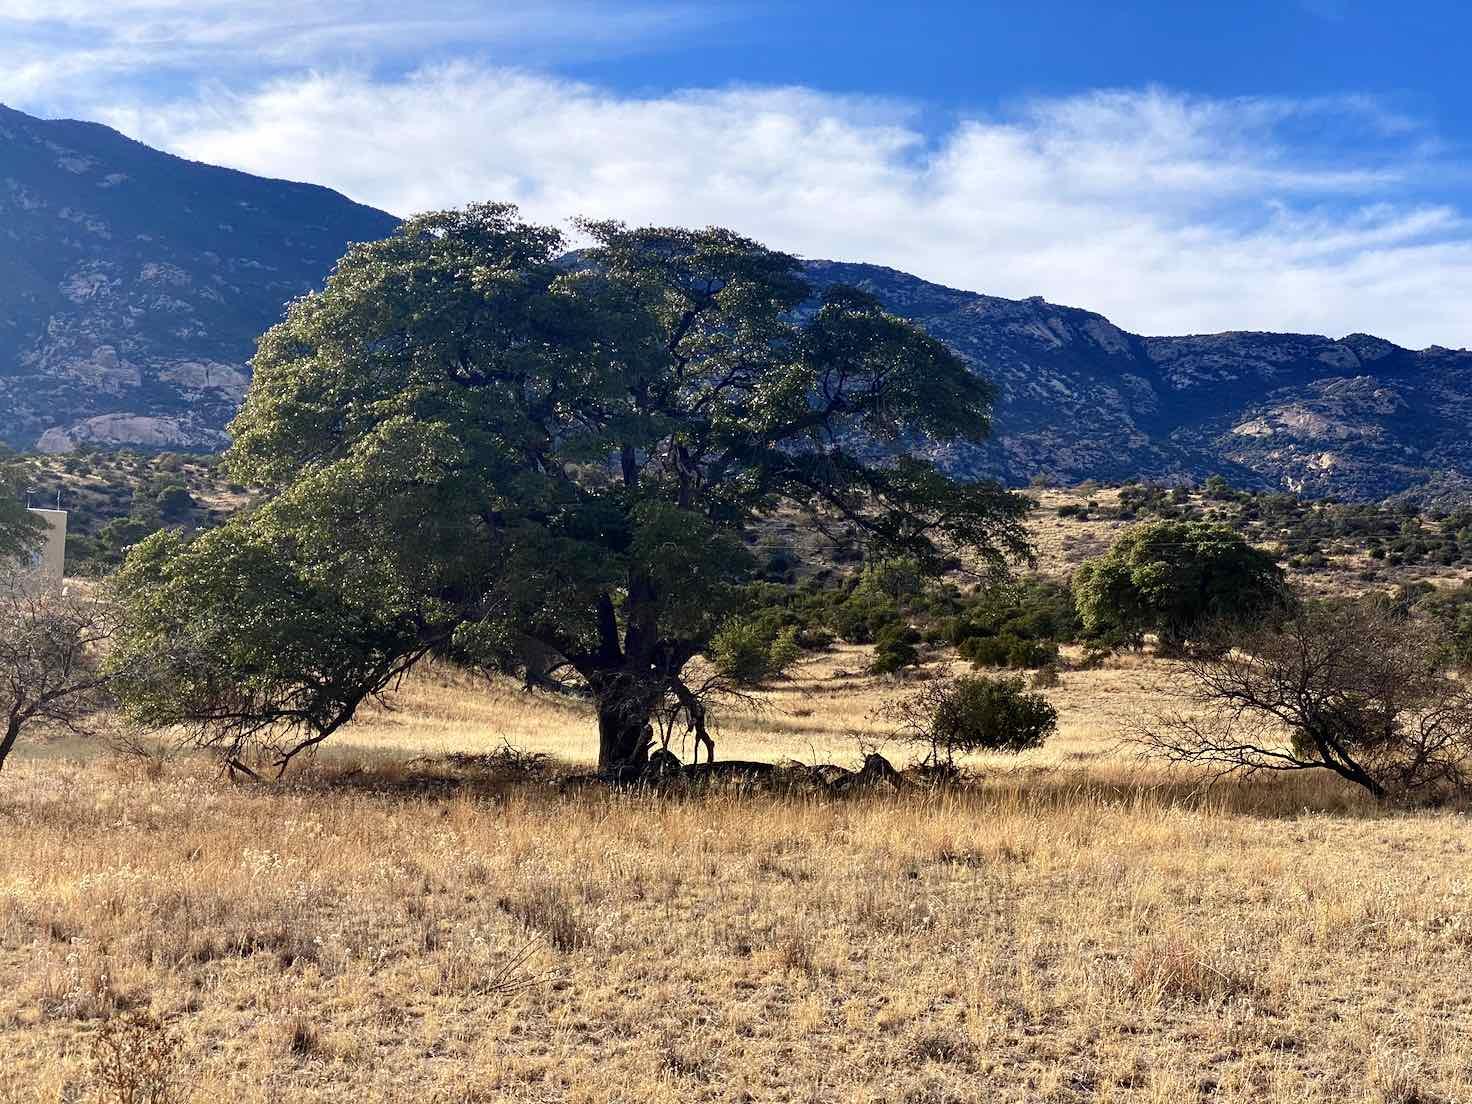 A big oak tree in Happy Valley off of Mescal road.